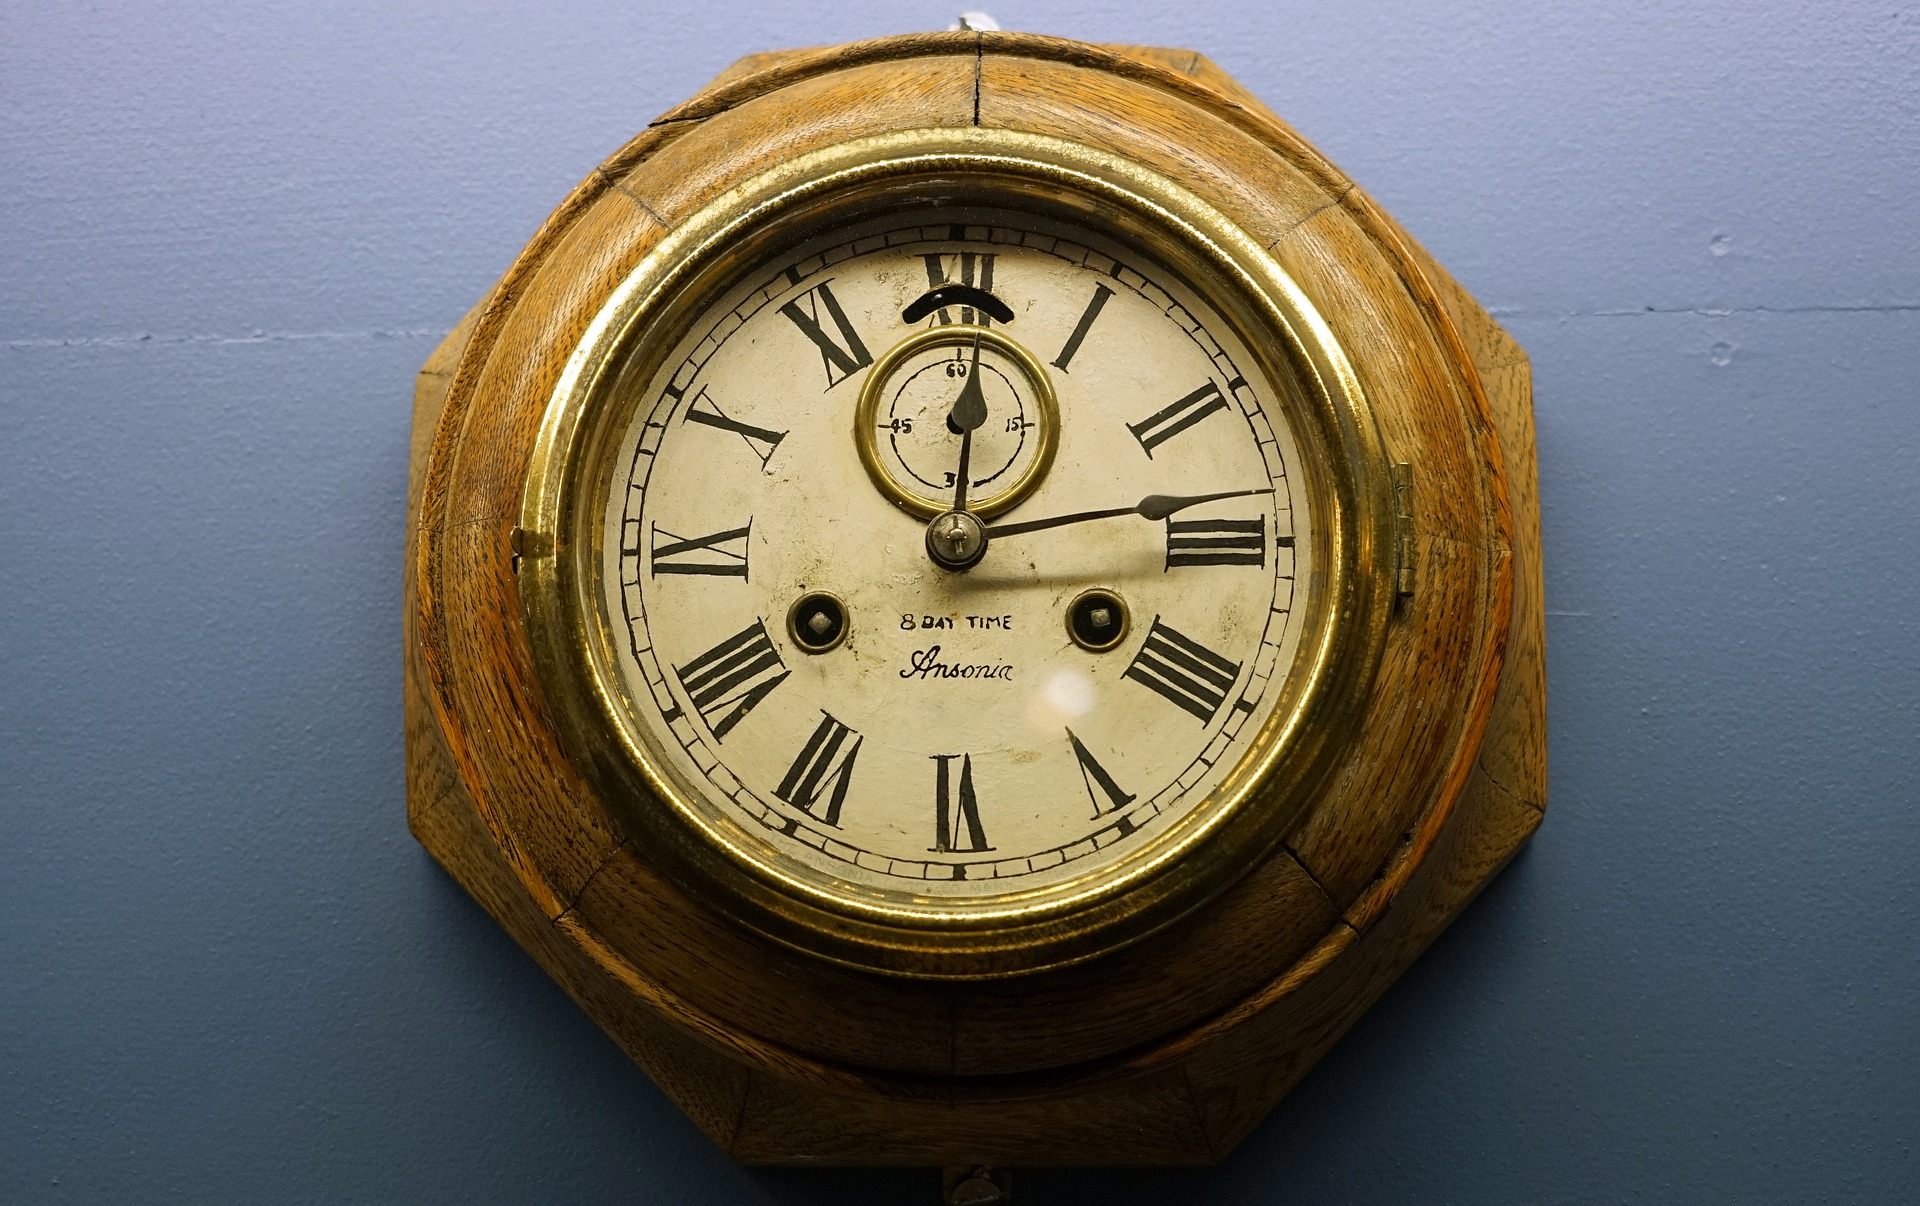 clock-2143830_1920.jpg